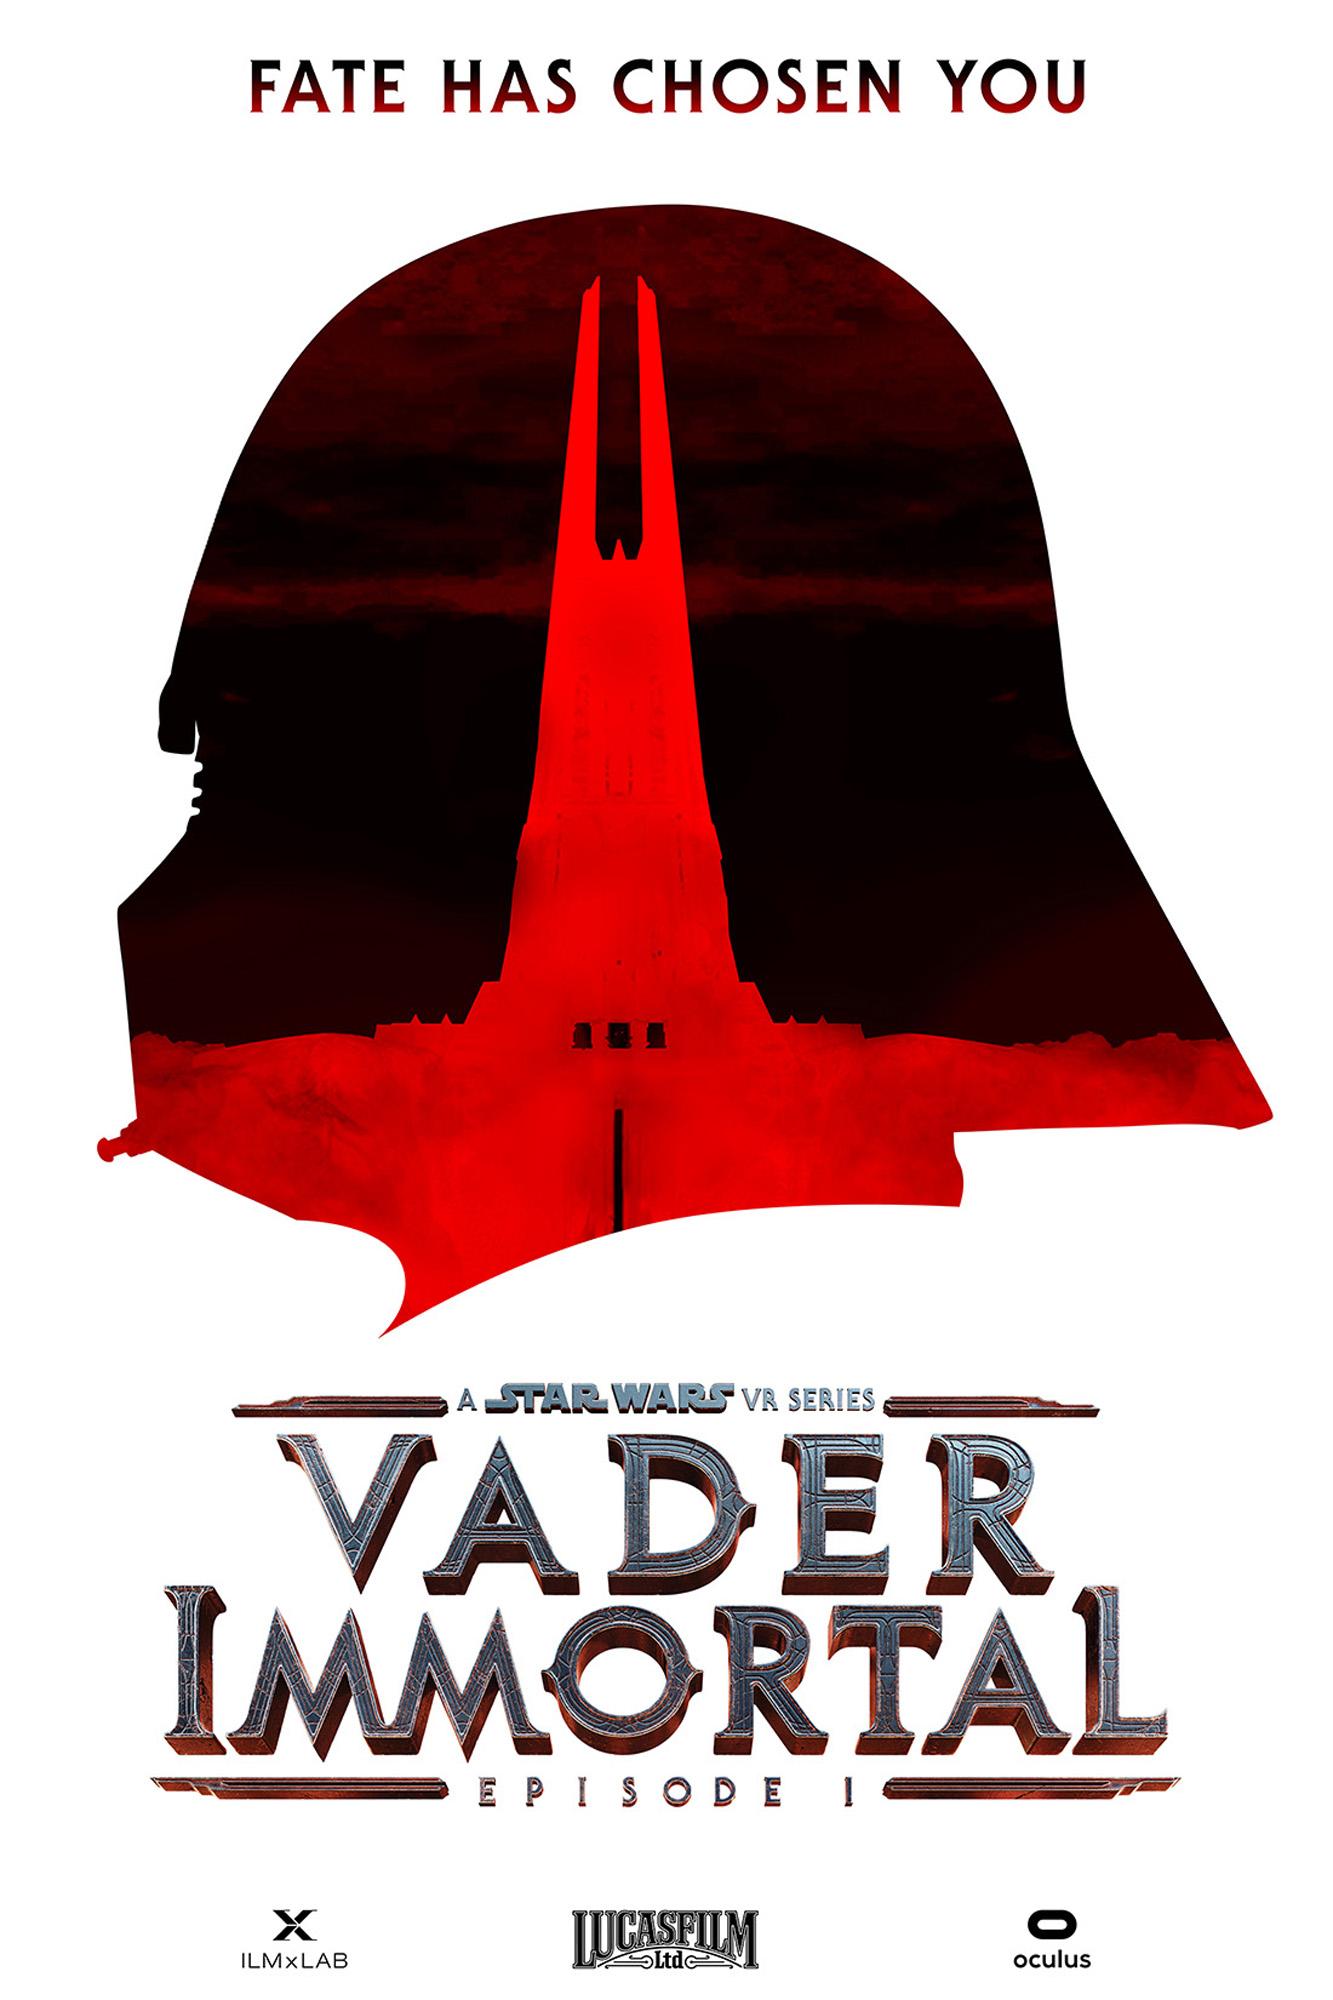 Vader ImmortalEpisode 1PosterCredit: ILMxLAB